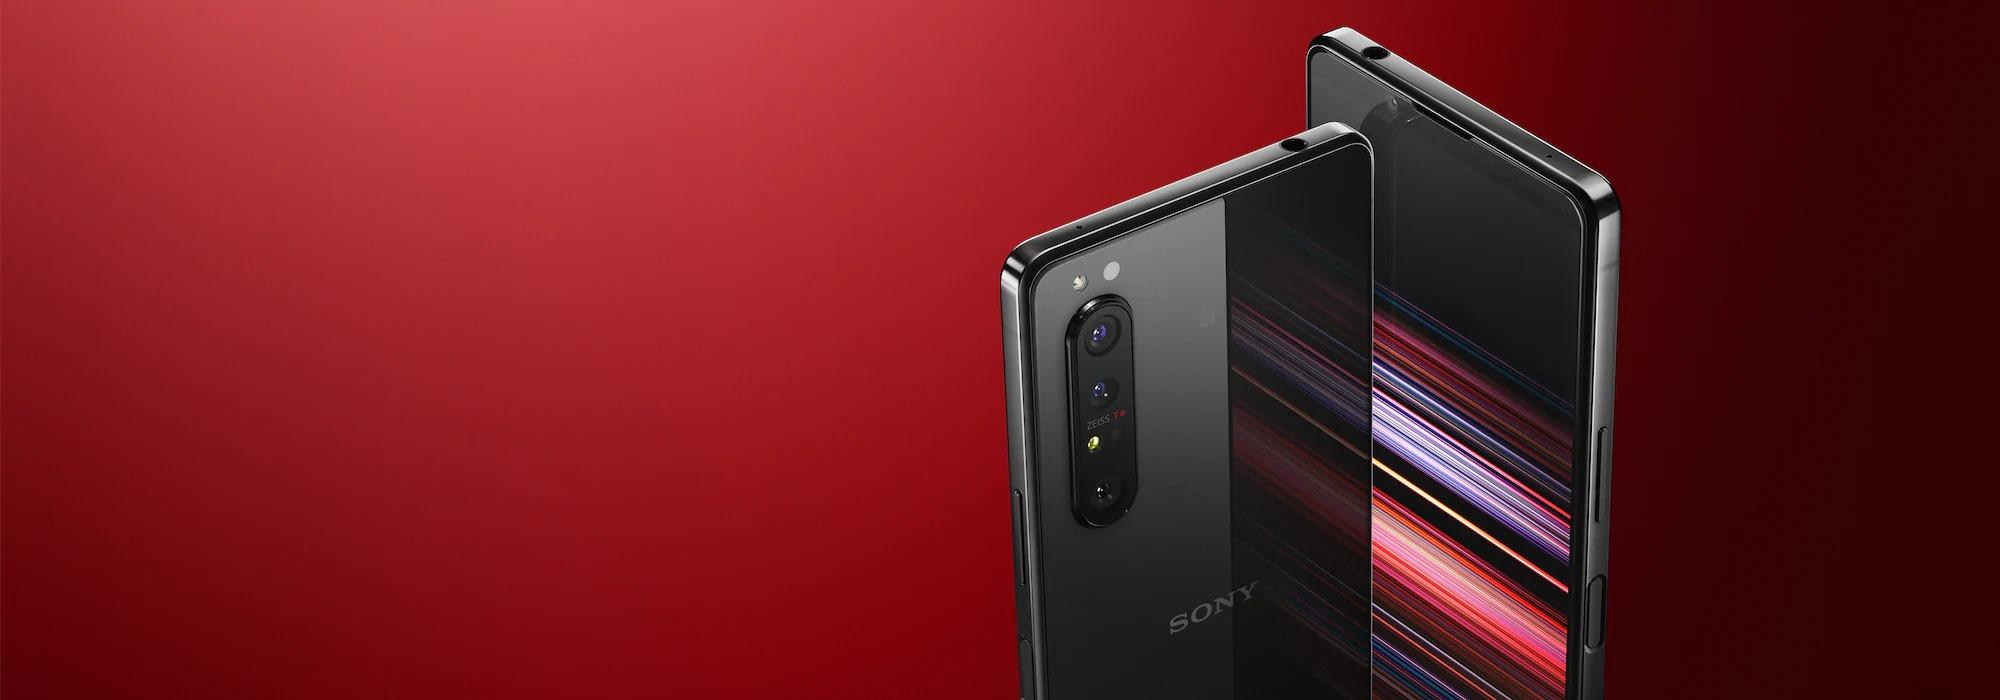 Điện thoại Sony Xperia 1 II - XQ-AT52